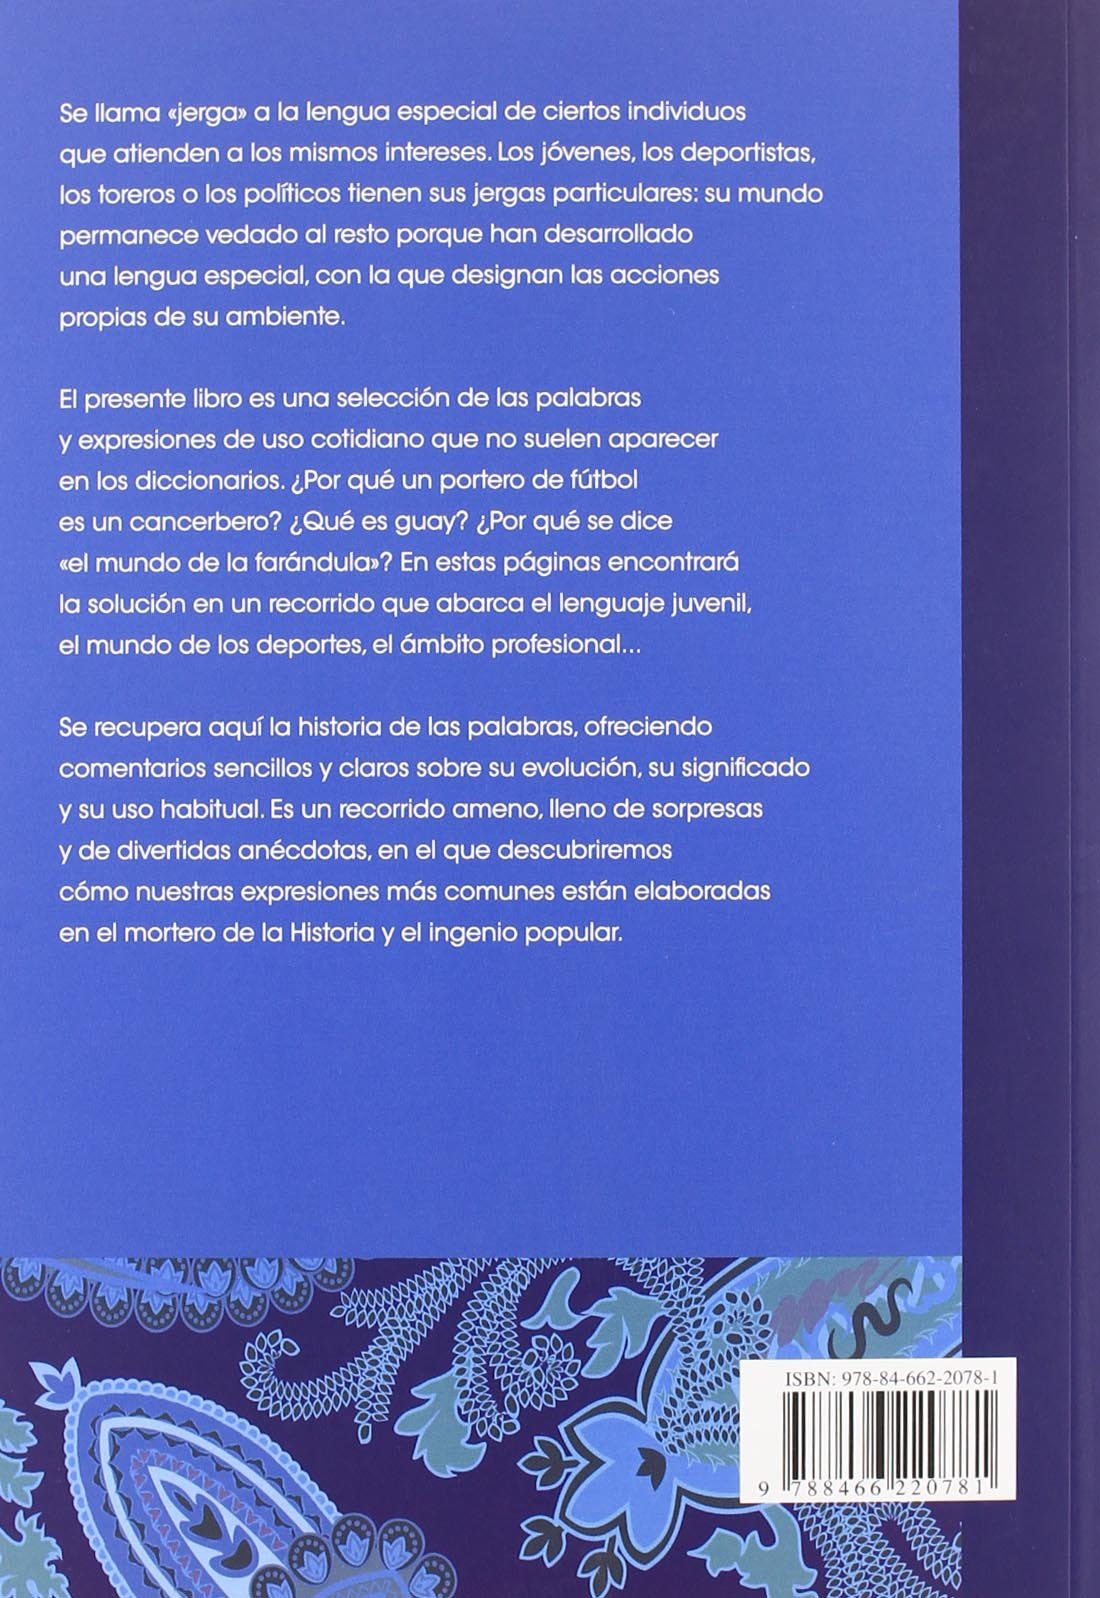 Frases informales, jergas y argot / Informal phrases, slangs (Spanish Edition): Jose Calles Vales, Belen Bermejo Melendez: 9788466220781: Amazon.com: Books